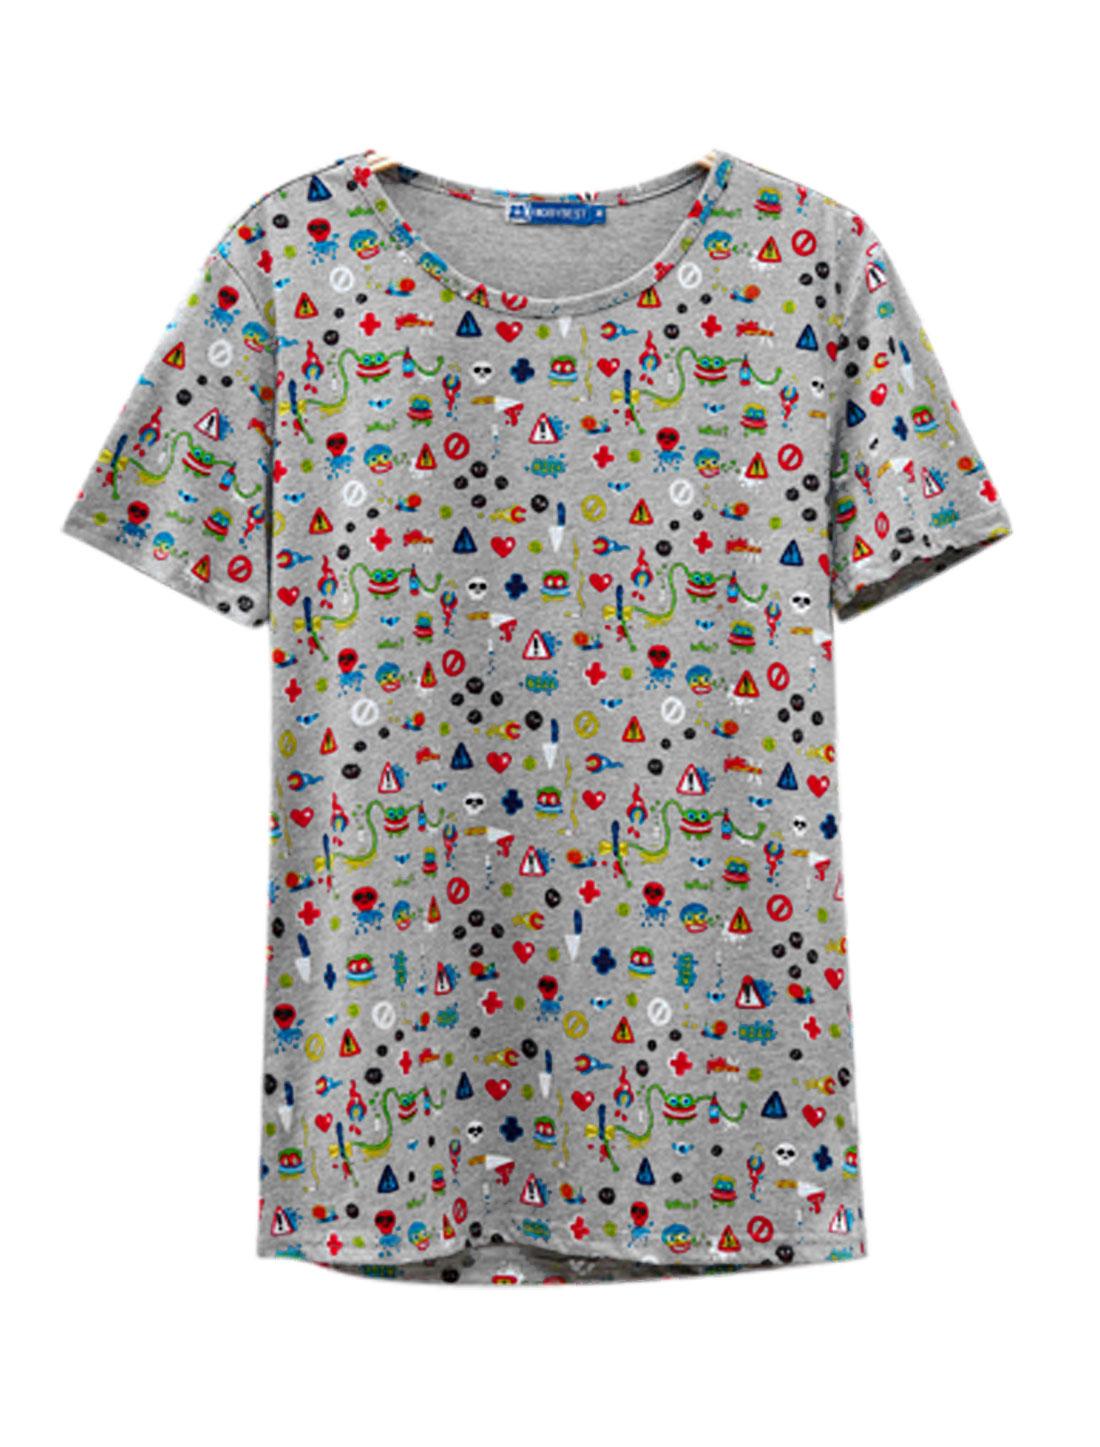 Men Round Neck Short Sleeve Novelty Prints Basic Tee Gray M